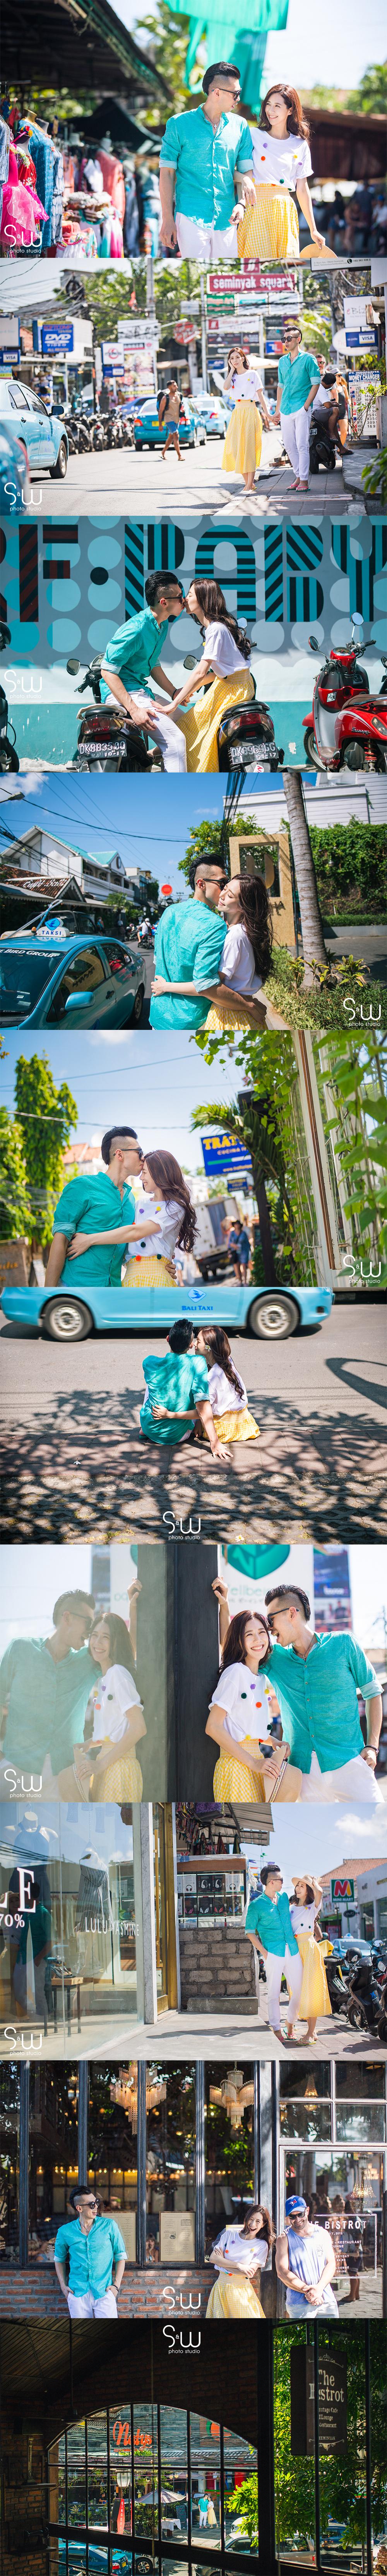 PRE WEDDING | BALI (峇里島婚紗) | sw photo studio 婚禮, 婚攝, 婚紗, 海外婚禮, 海外婚紗, 海島婚禮,峇里島婚禮, 峇里島婚紗, 台灣婚禮, 婚攝推薦